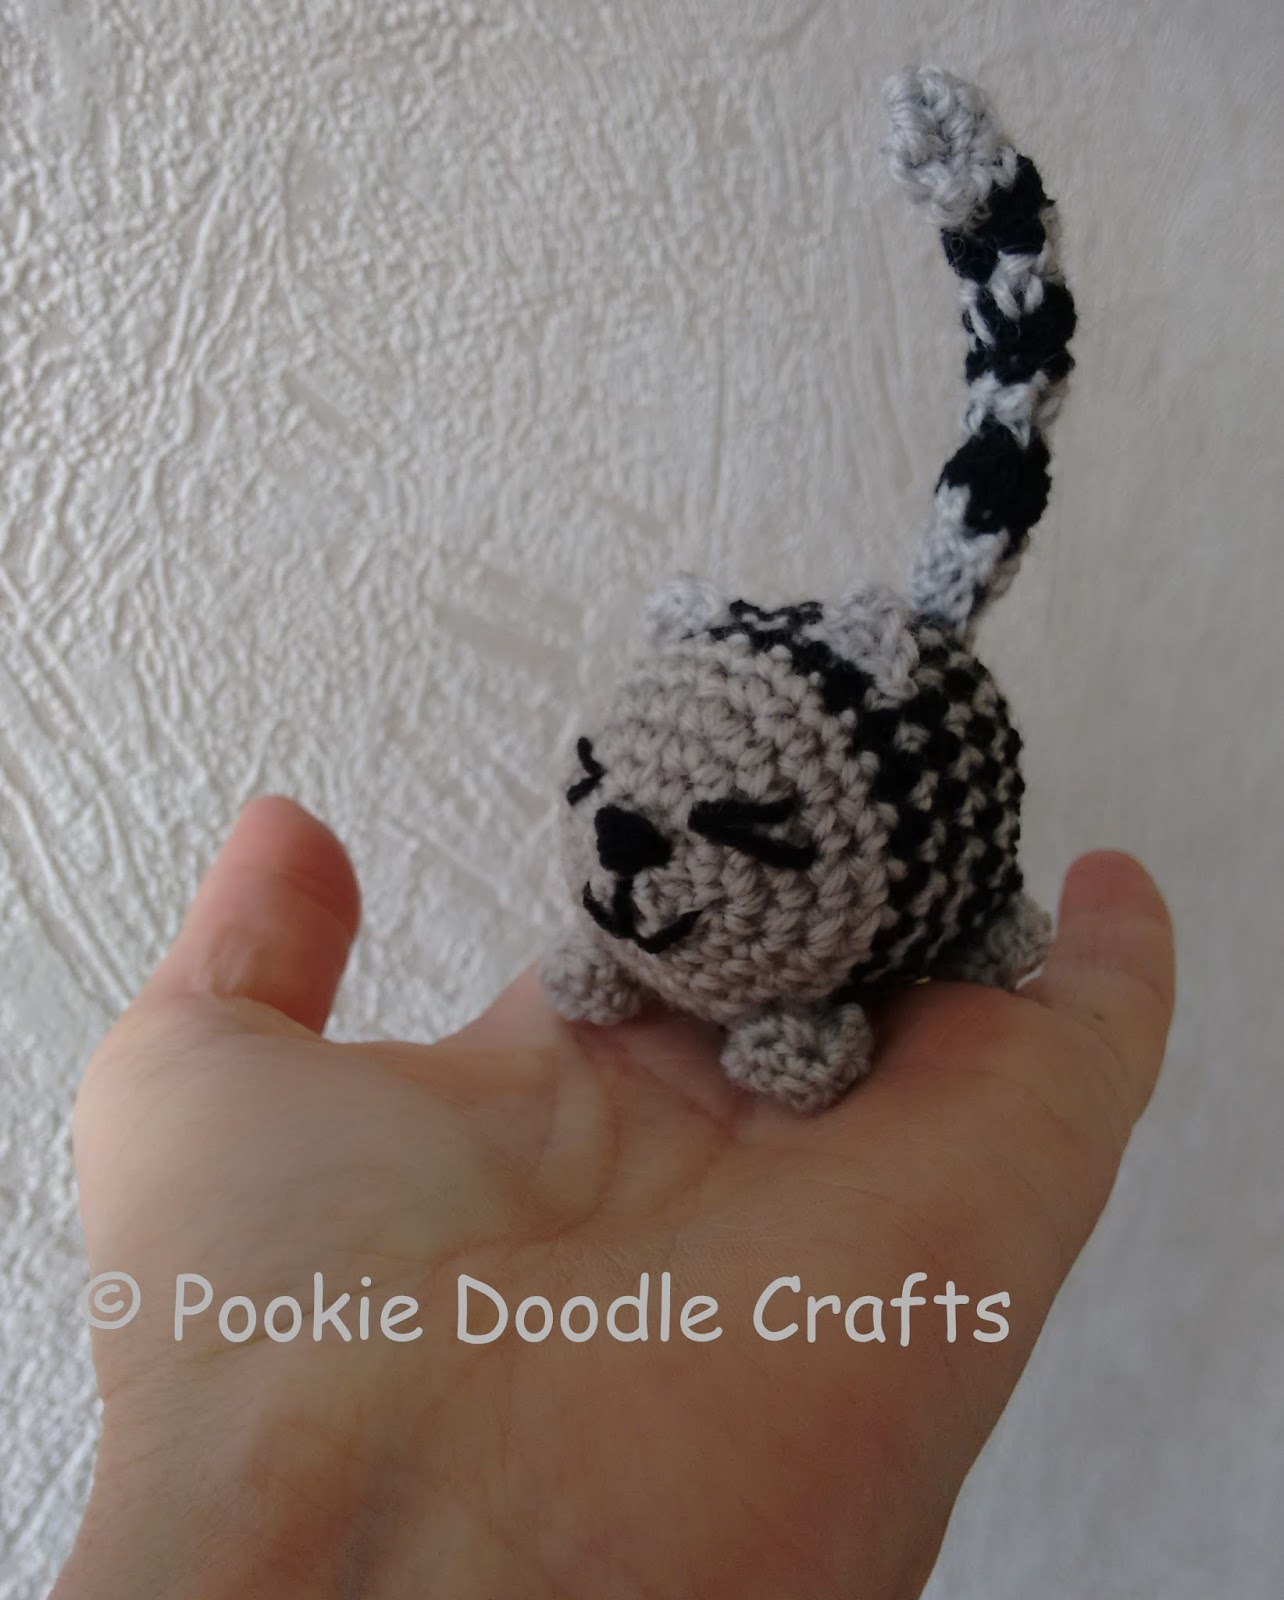 Tiny kitty cat amigurumi pattern - Amigurumi Today | 1600x1284